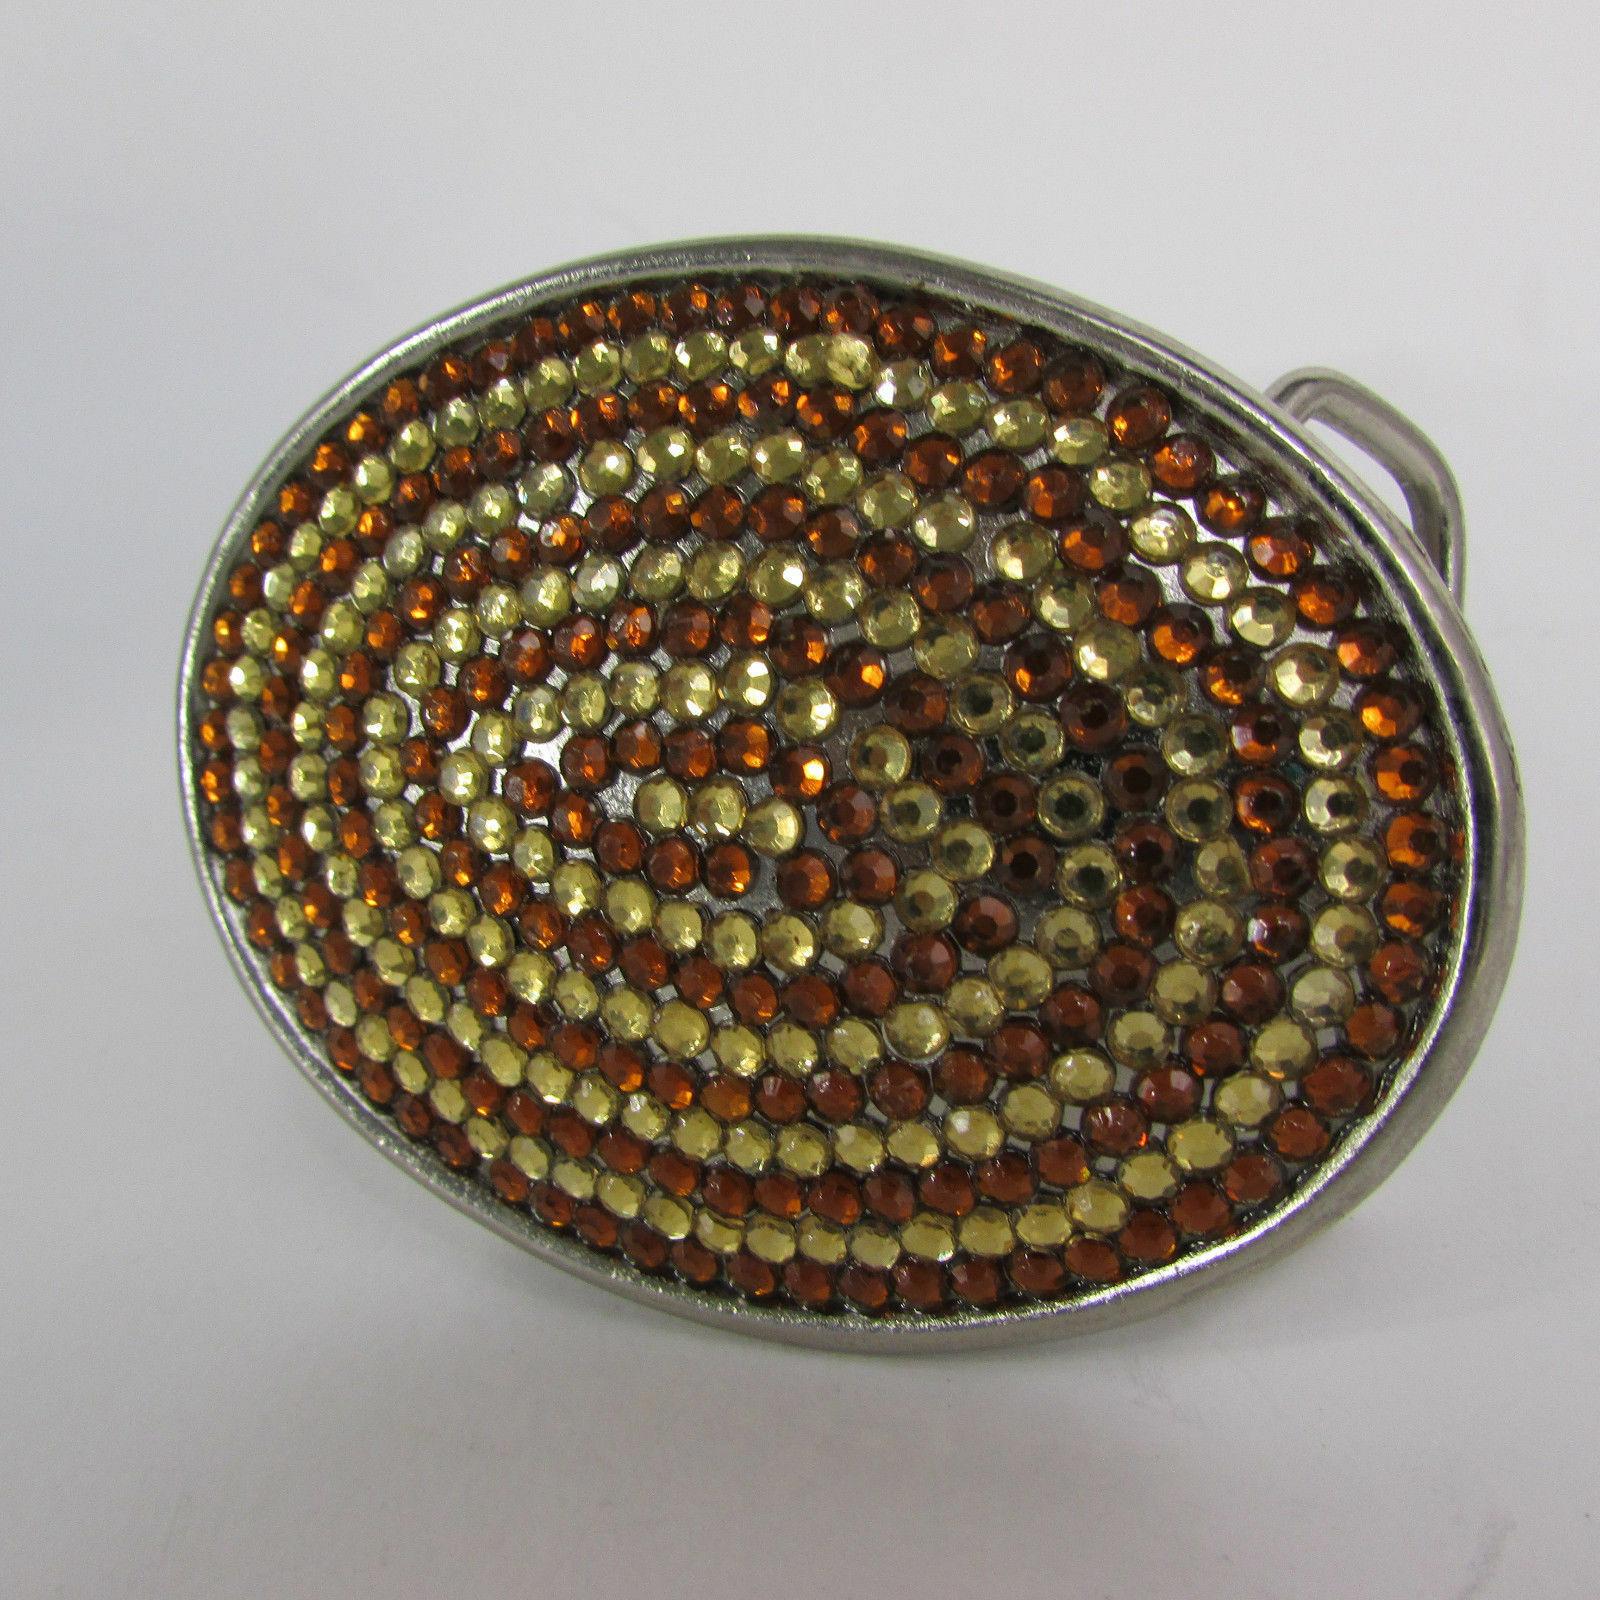 Mode Cowgirl Herren Damen Oval Gürtelschnalle Western Silber Metall Braun Strass